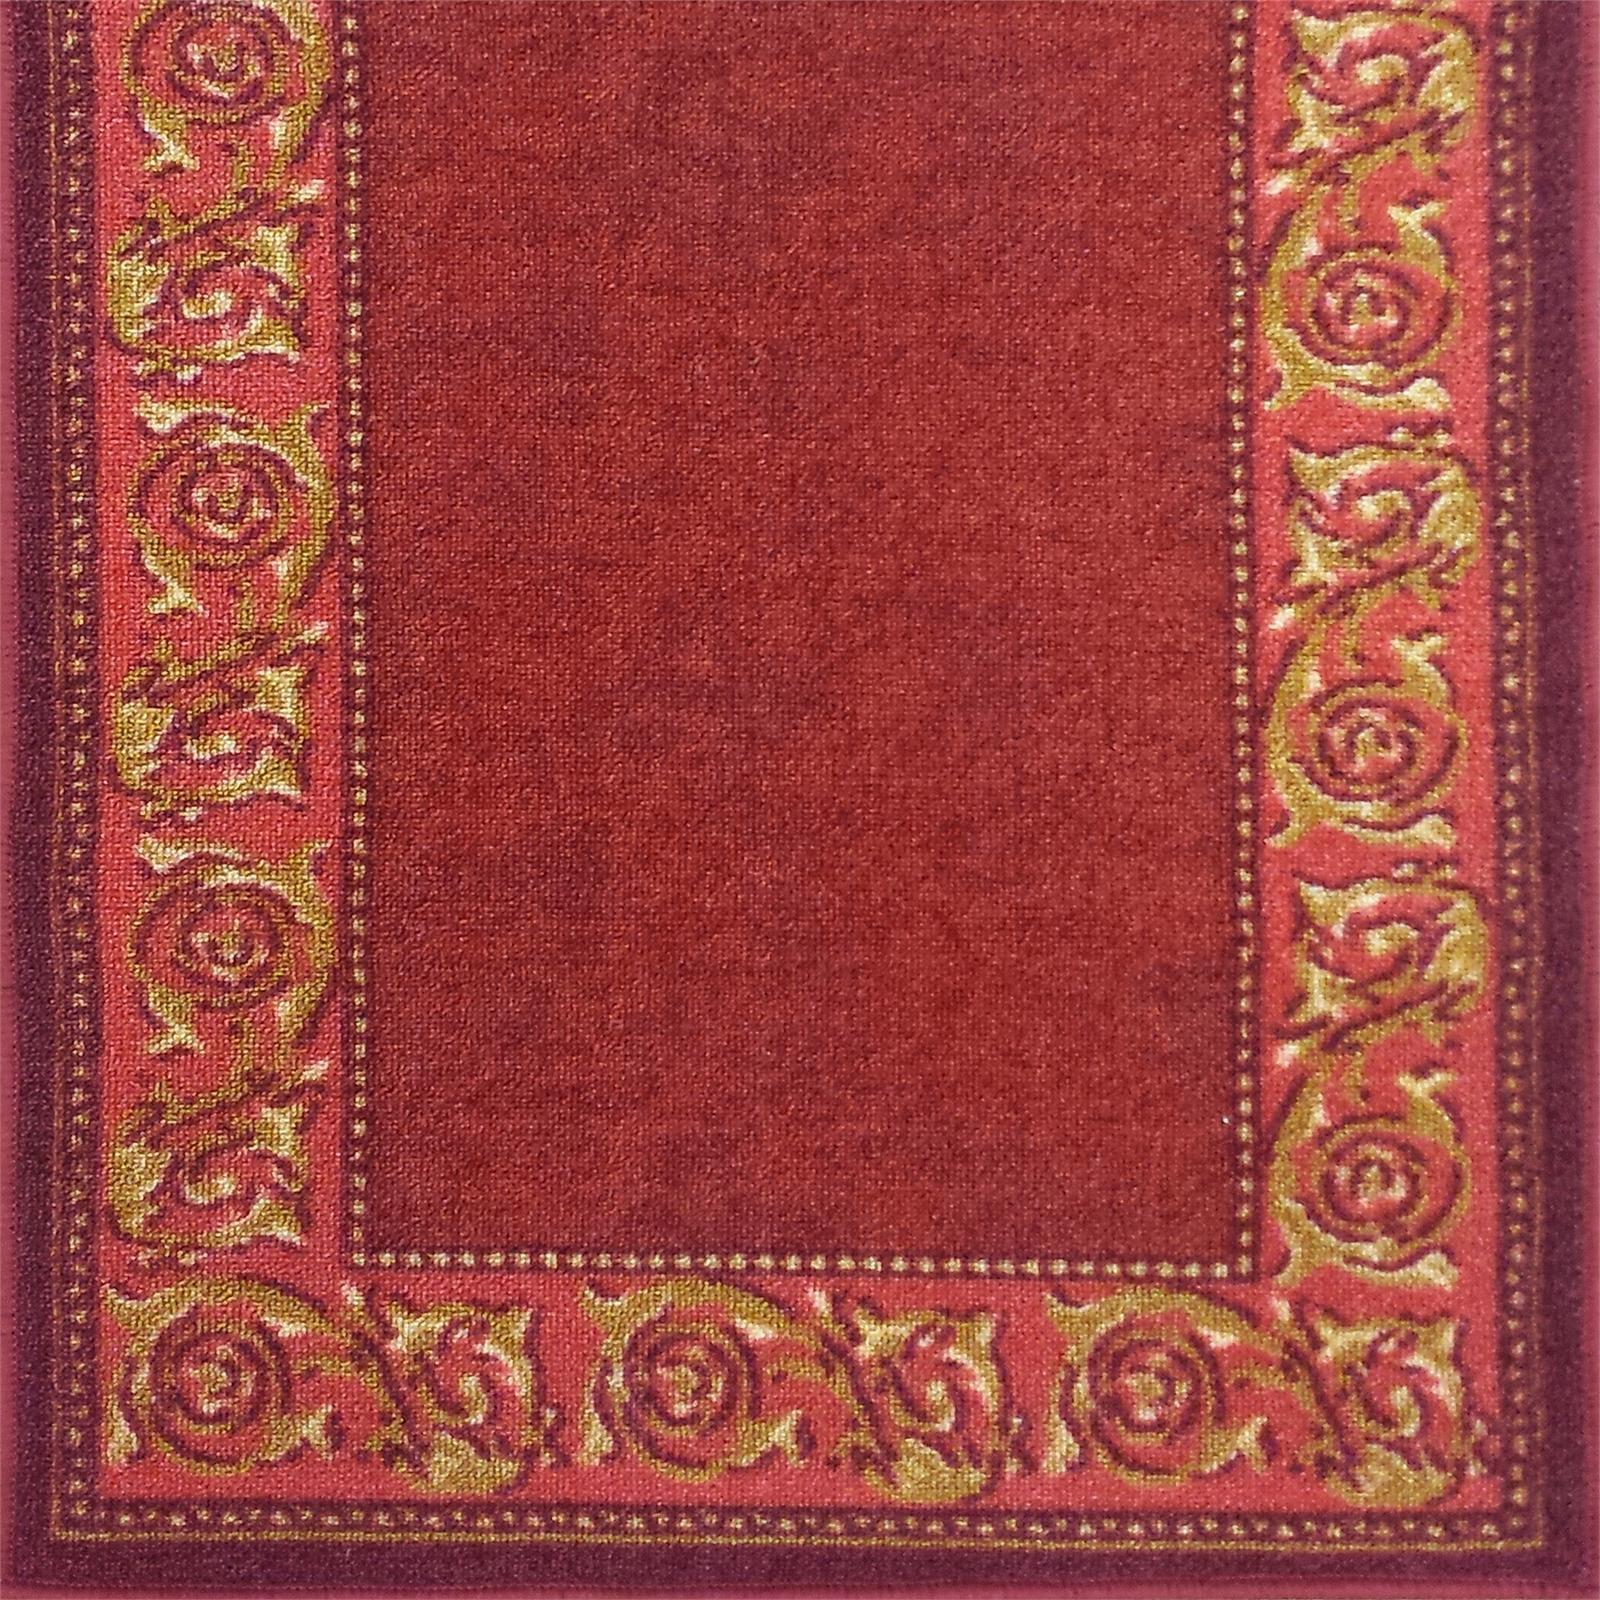 Ideal DIY 67 x 180cm Gold Leaf Red Loop Pile Carpet Runner